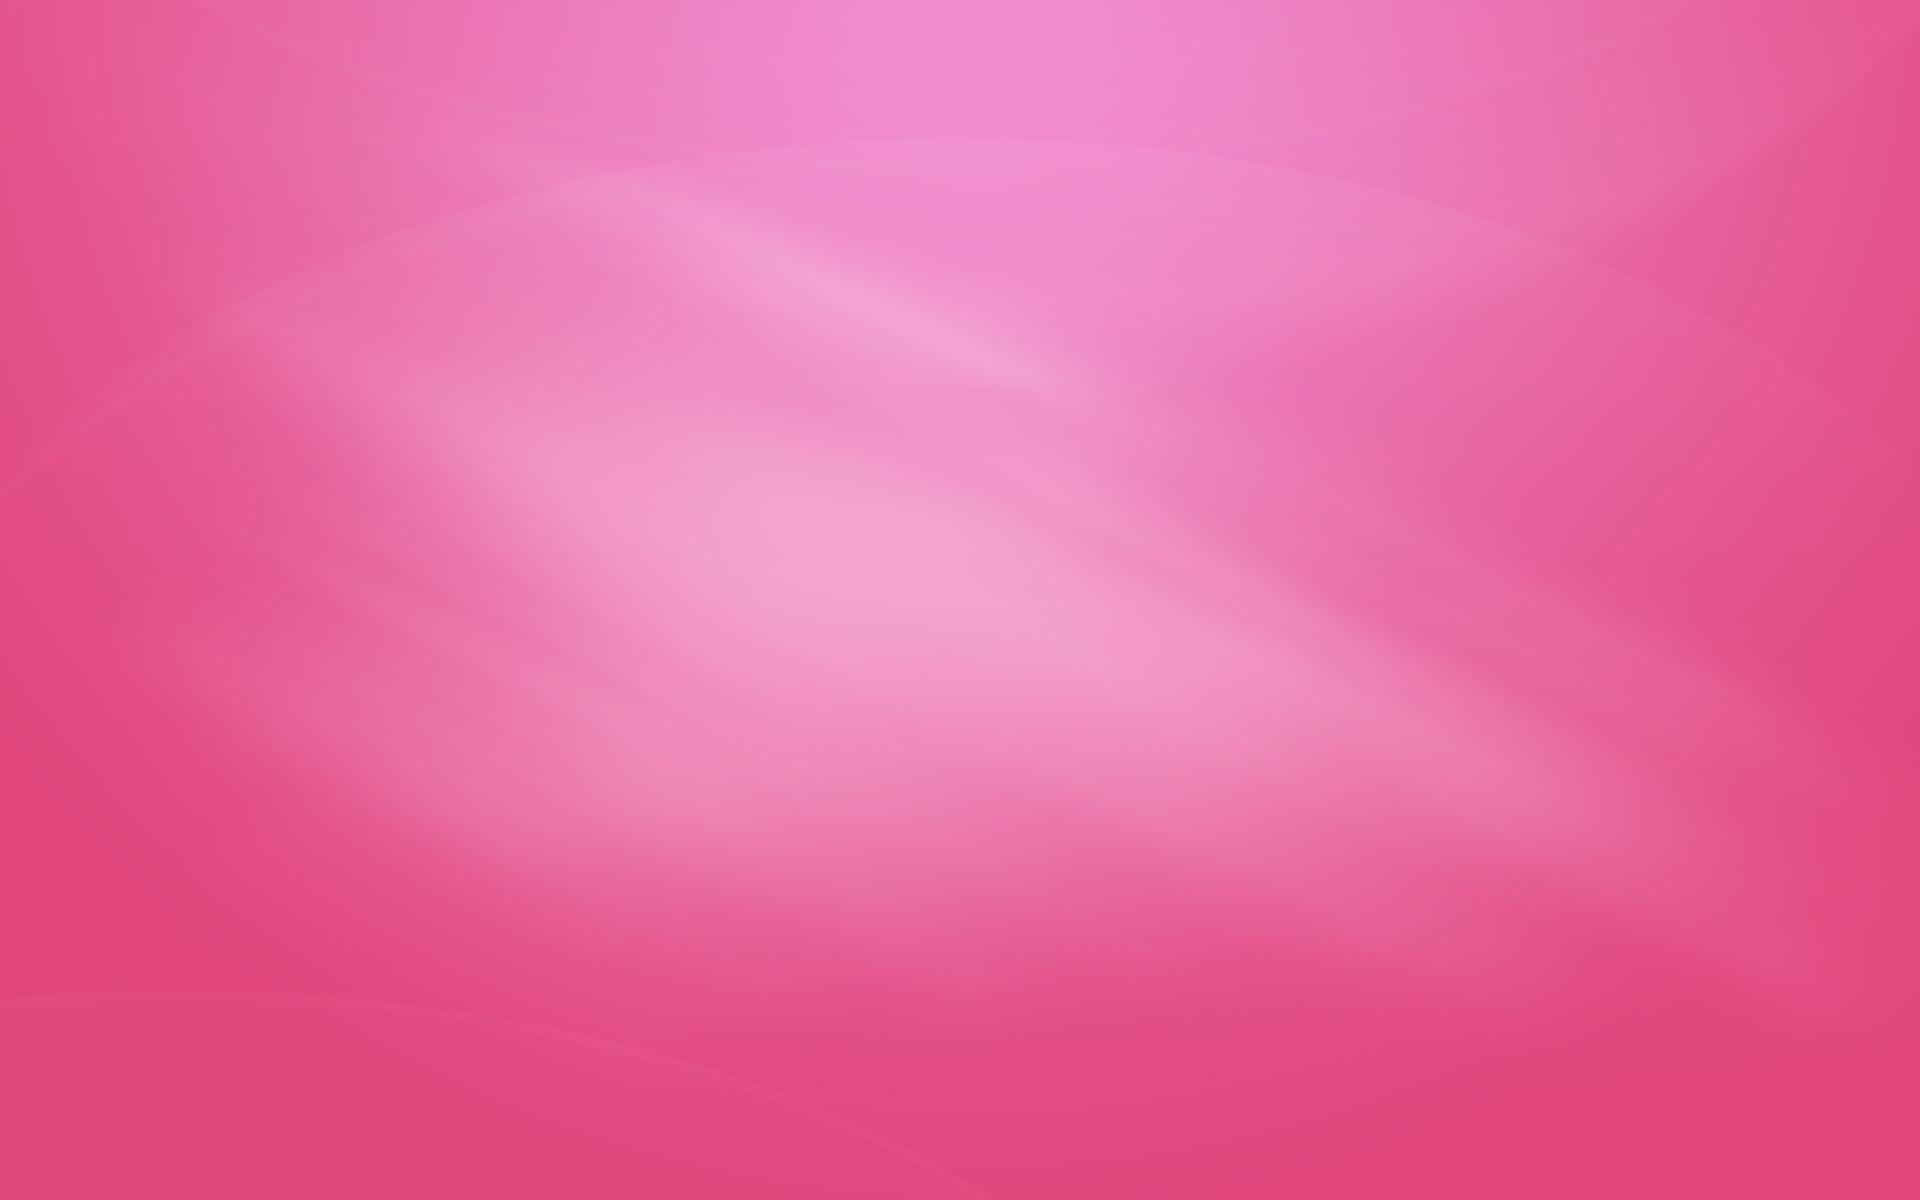 escape wallpapers pink background desktop 1920x1200 1920x1200